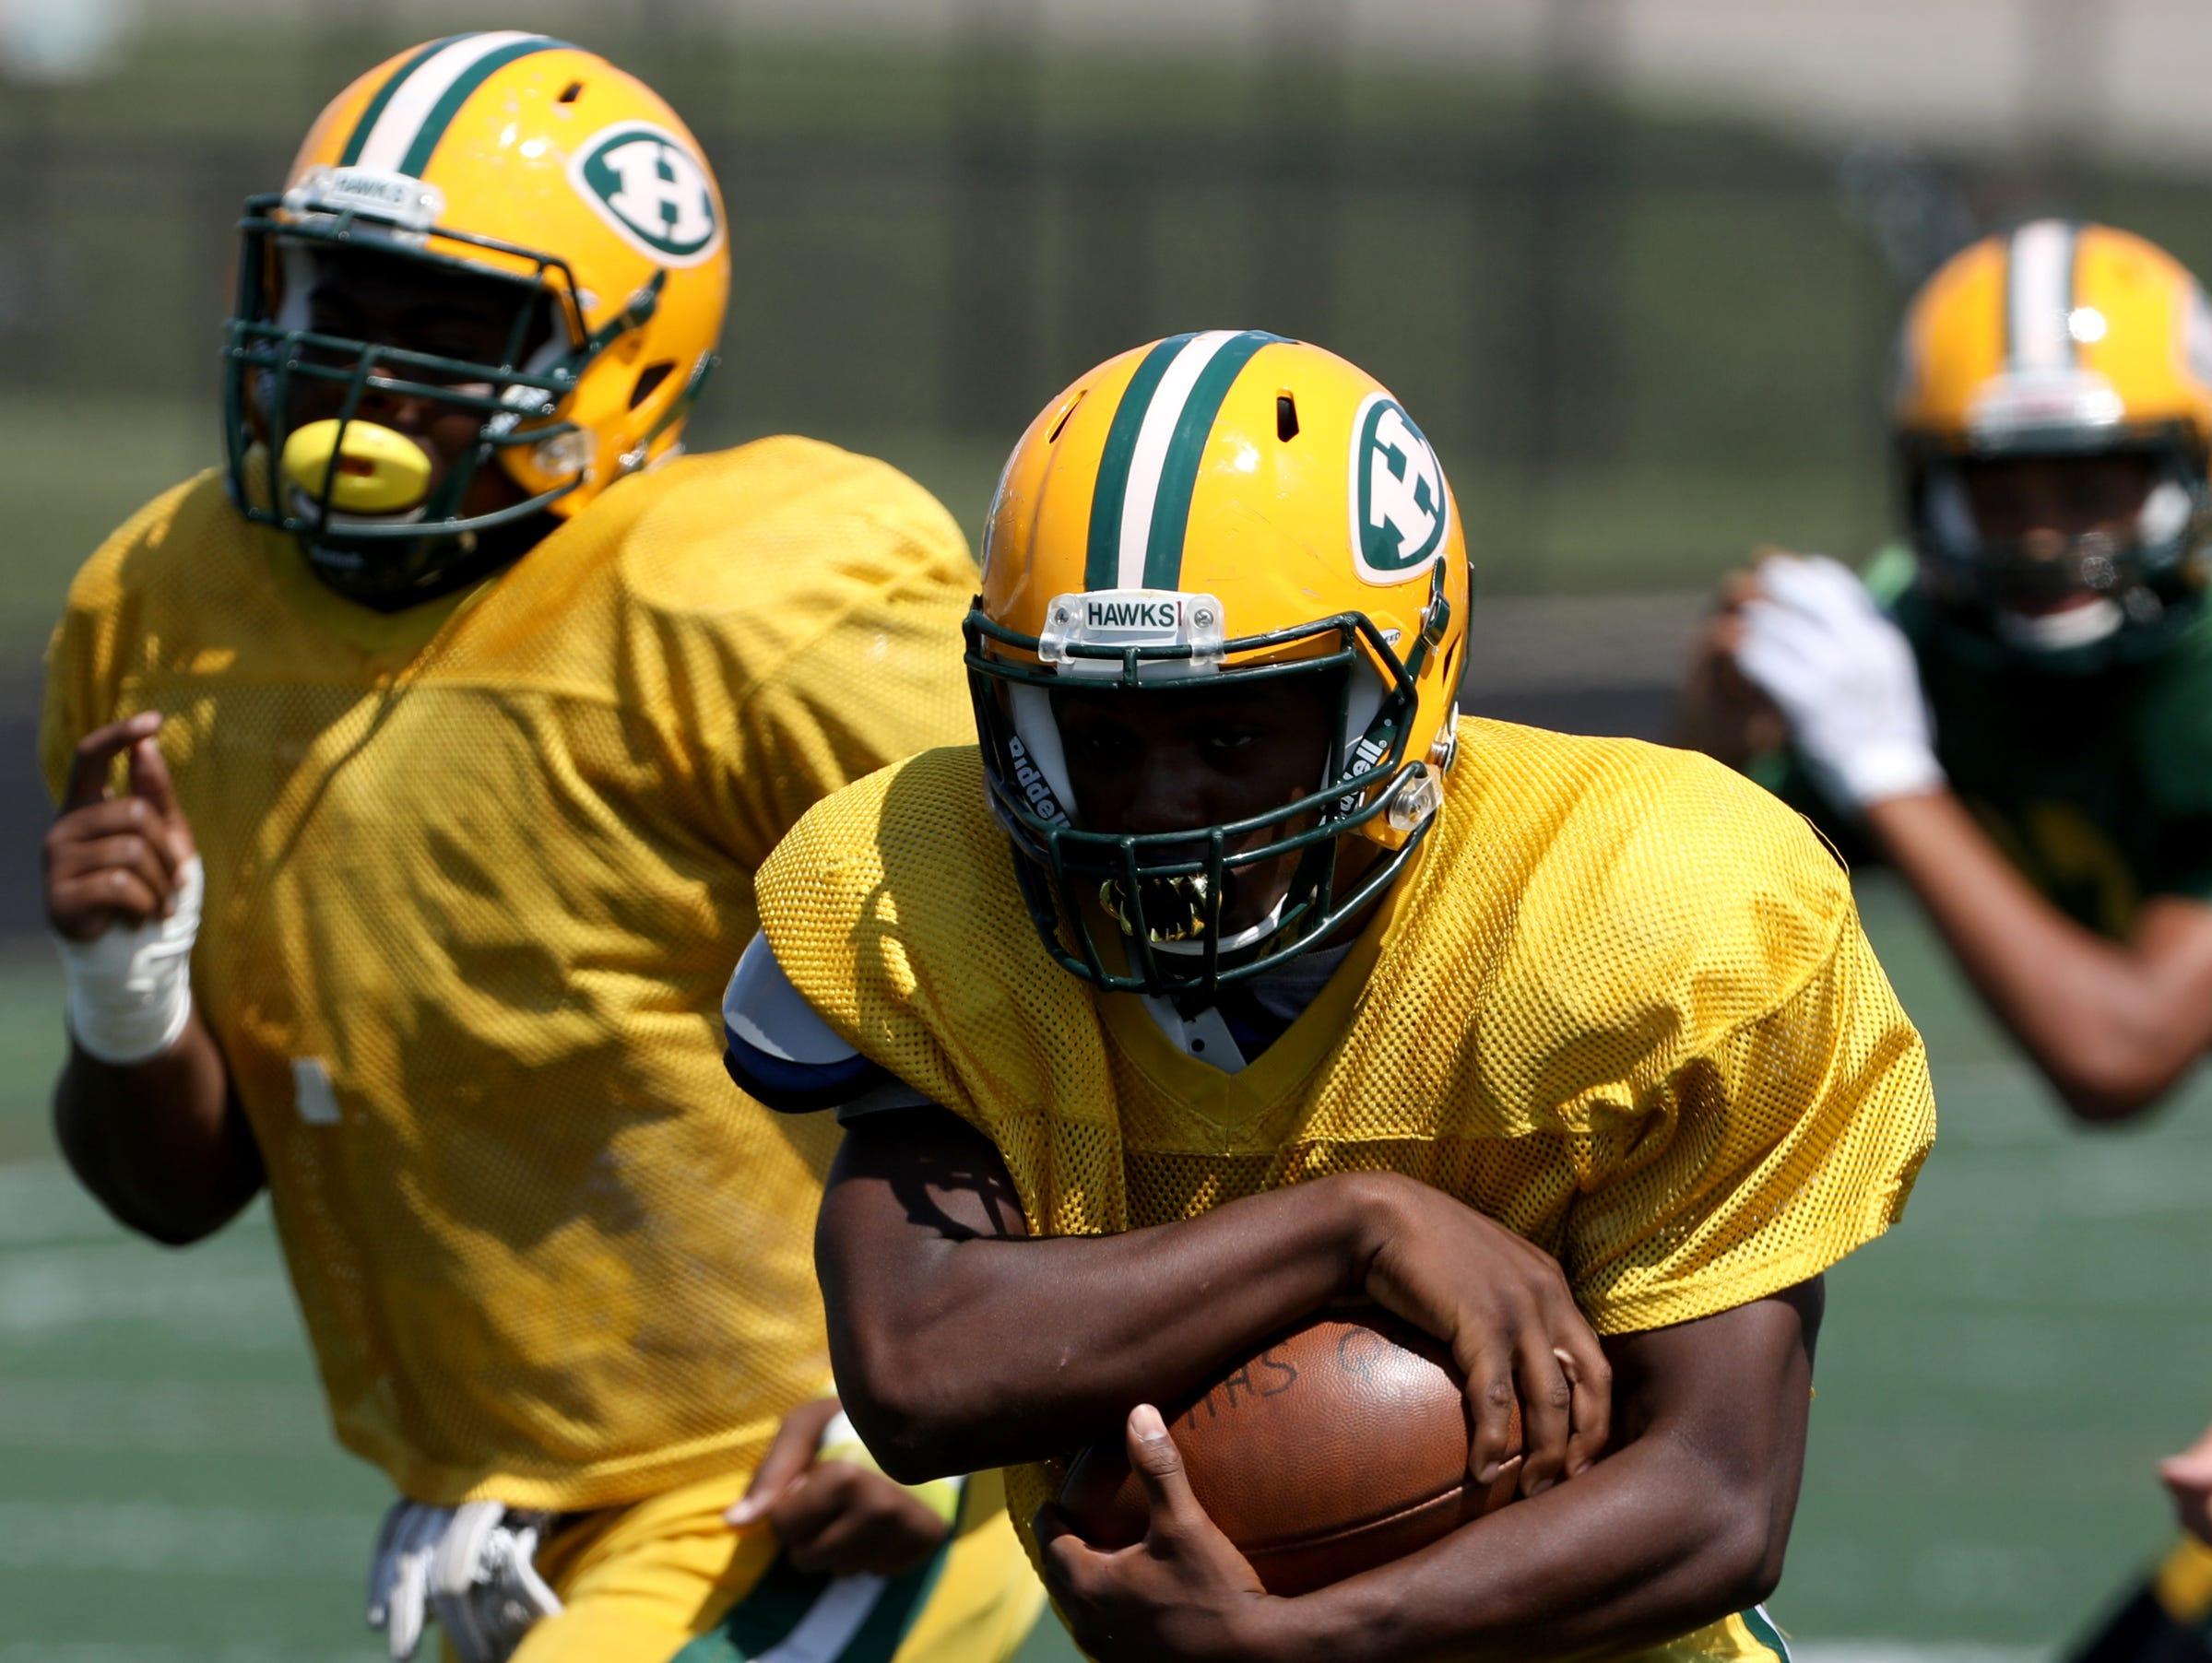 Vincent Rawls takes the handoff and runs down the field during Farmington Hills Harrison High School football practice at the school in Farmington Hills on Thursday, Aug. 23, 2018.